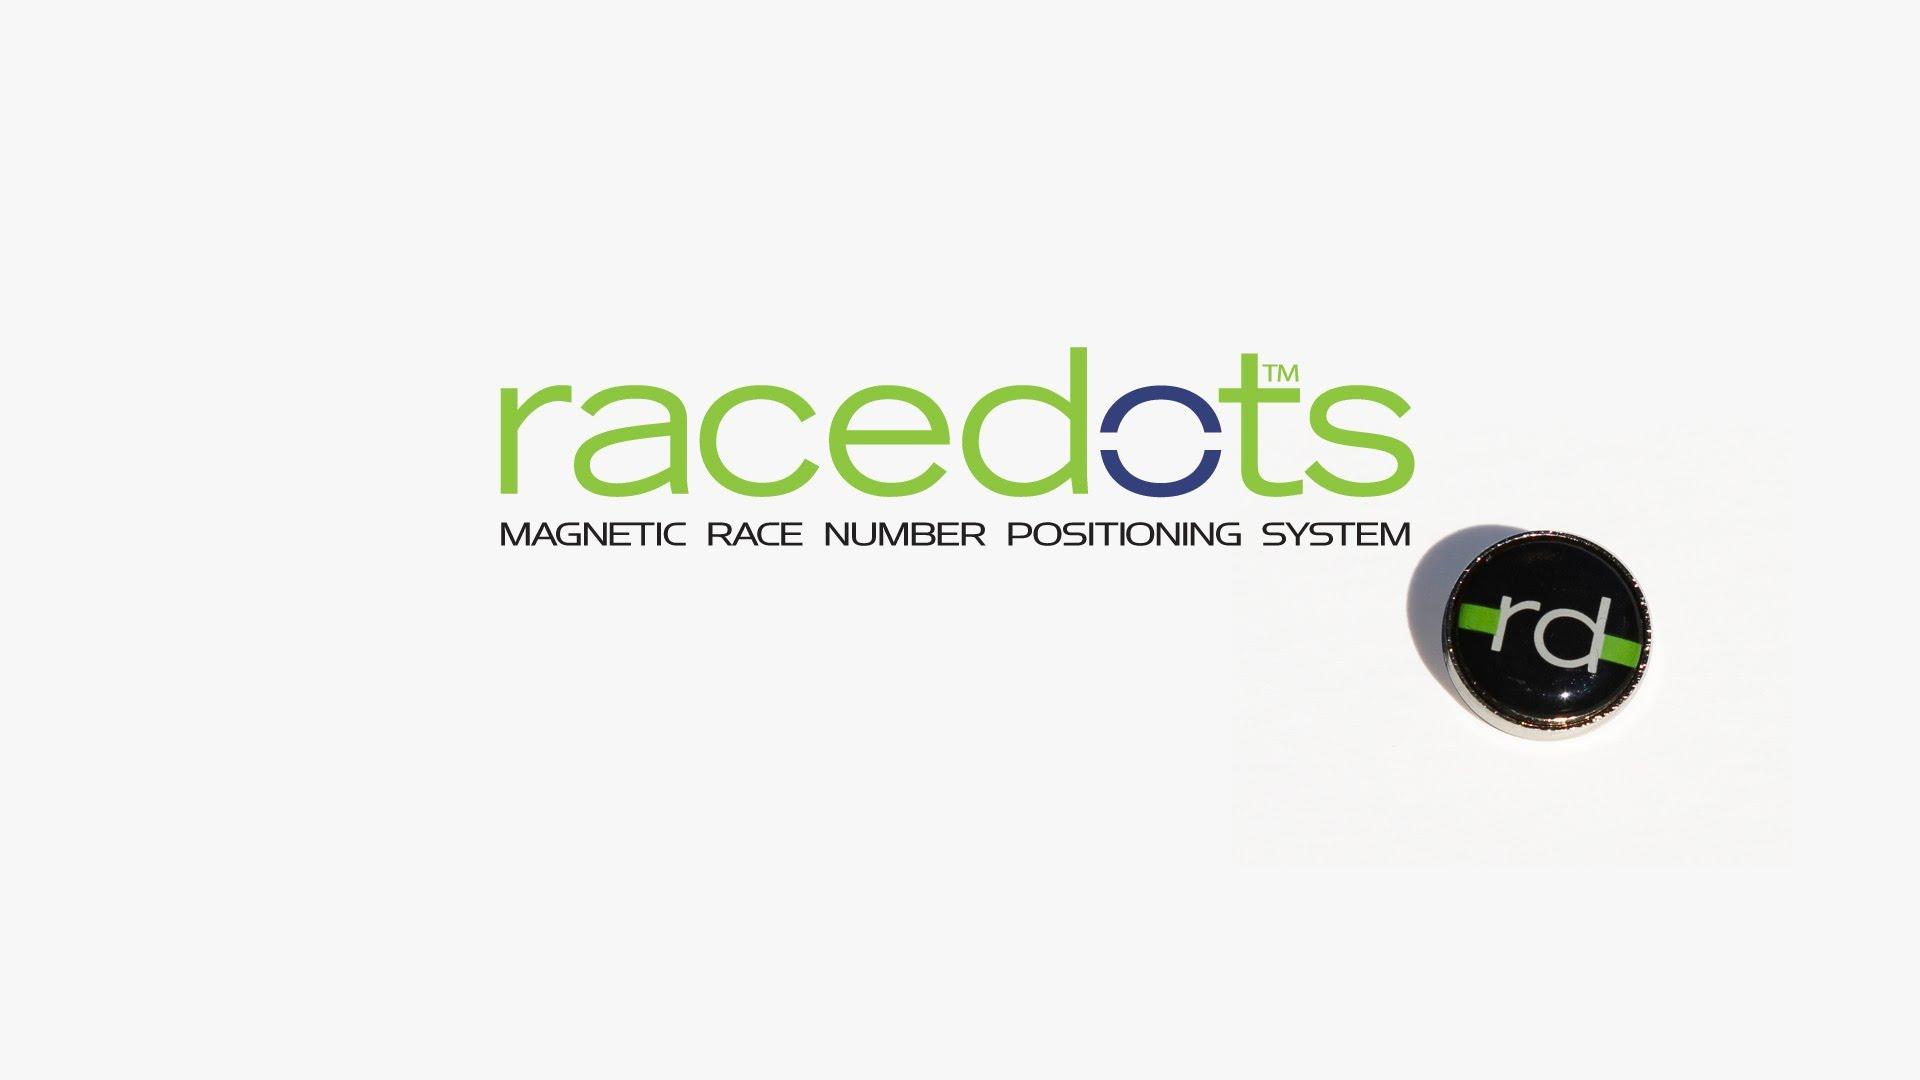 racedotslogo.jpg